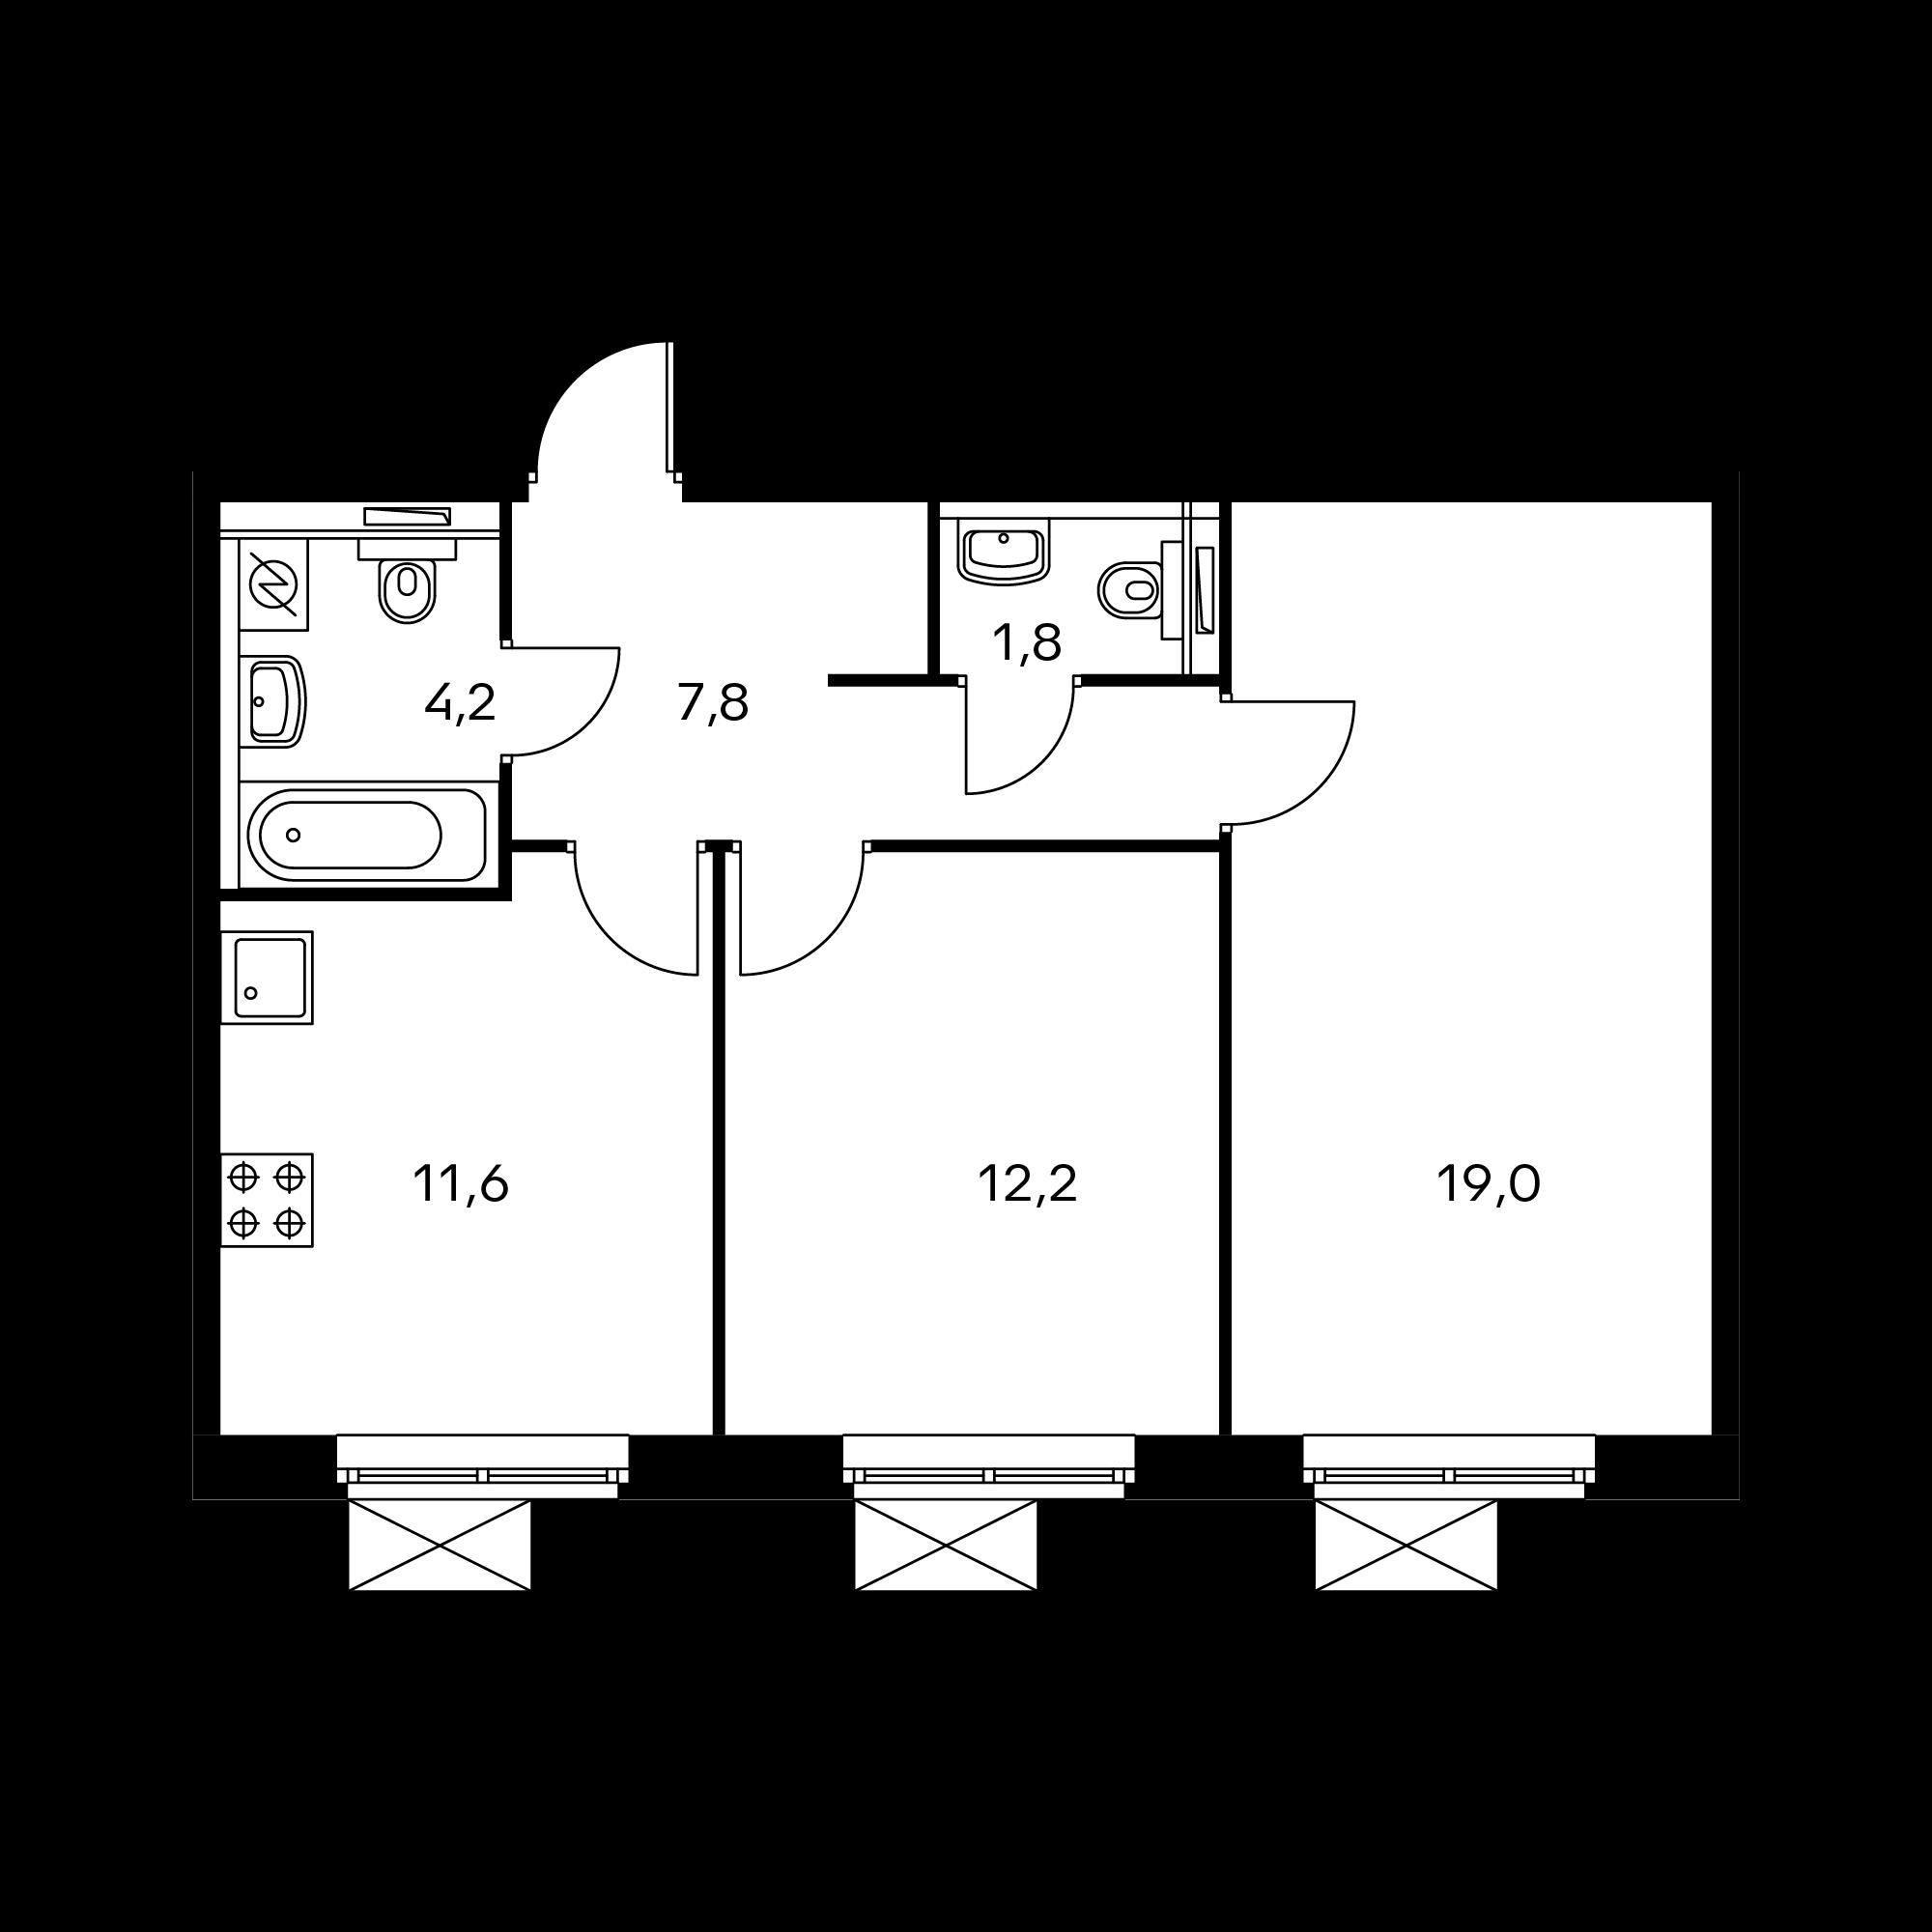 2KM6_9.9-2